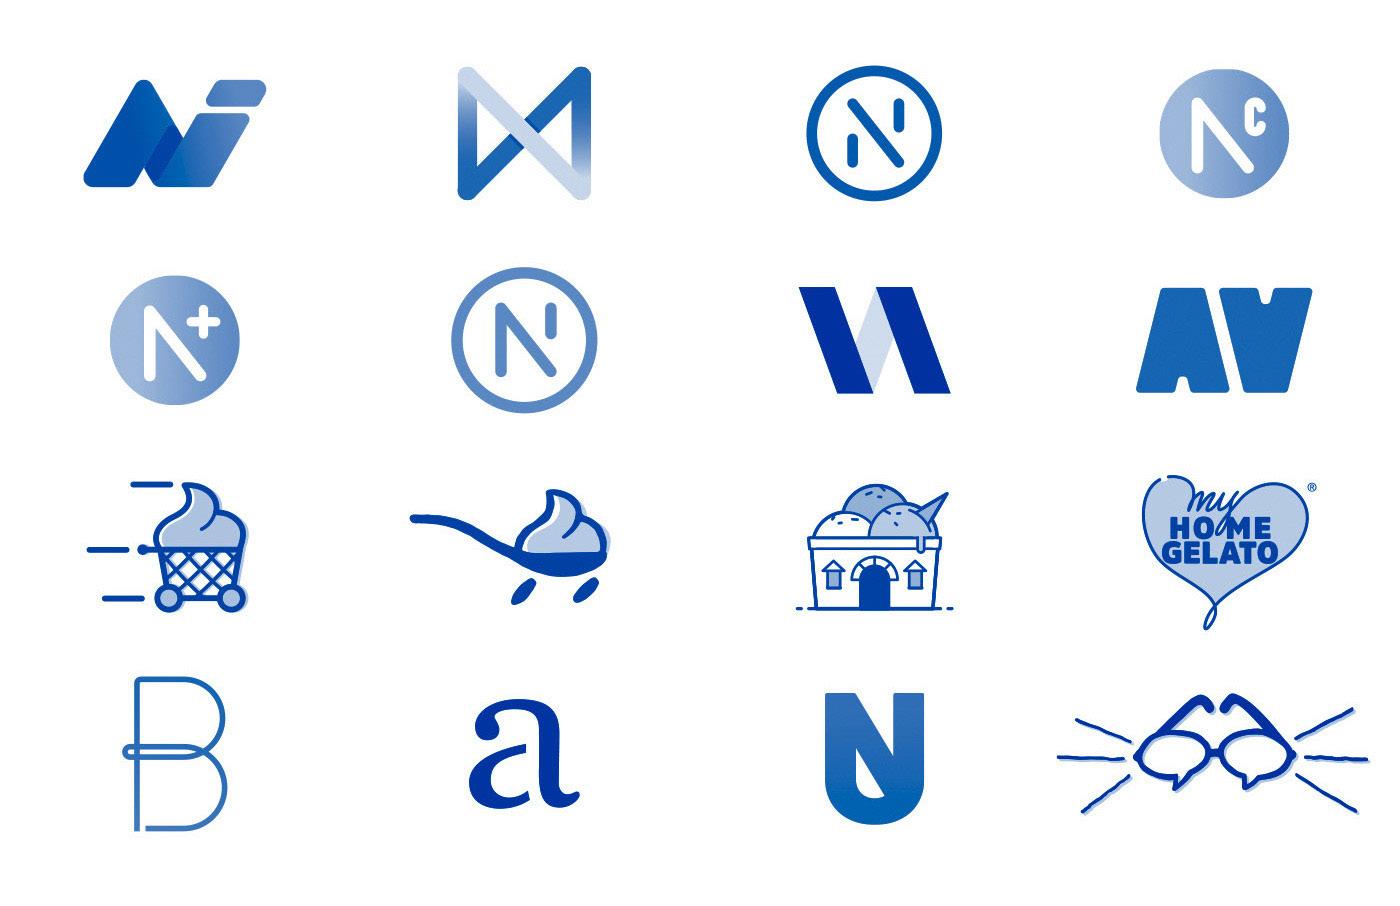 francesco-brisighelli-logofolio-2020